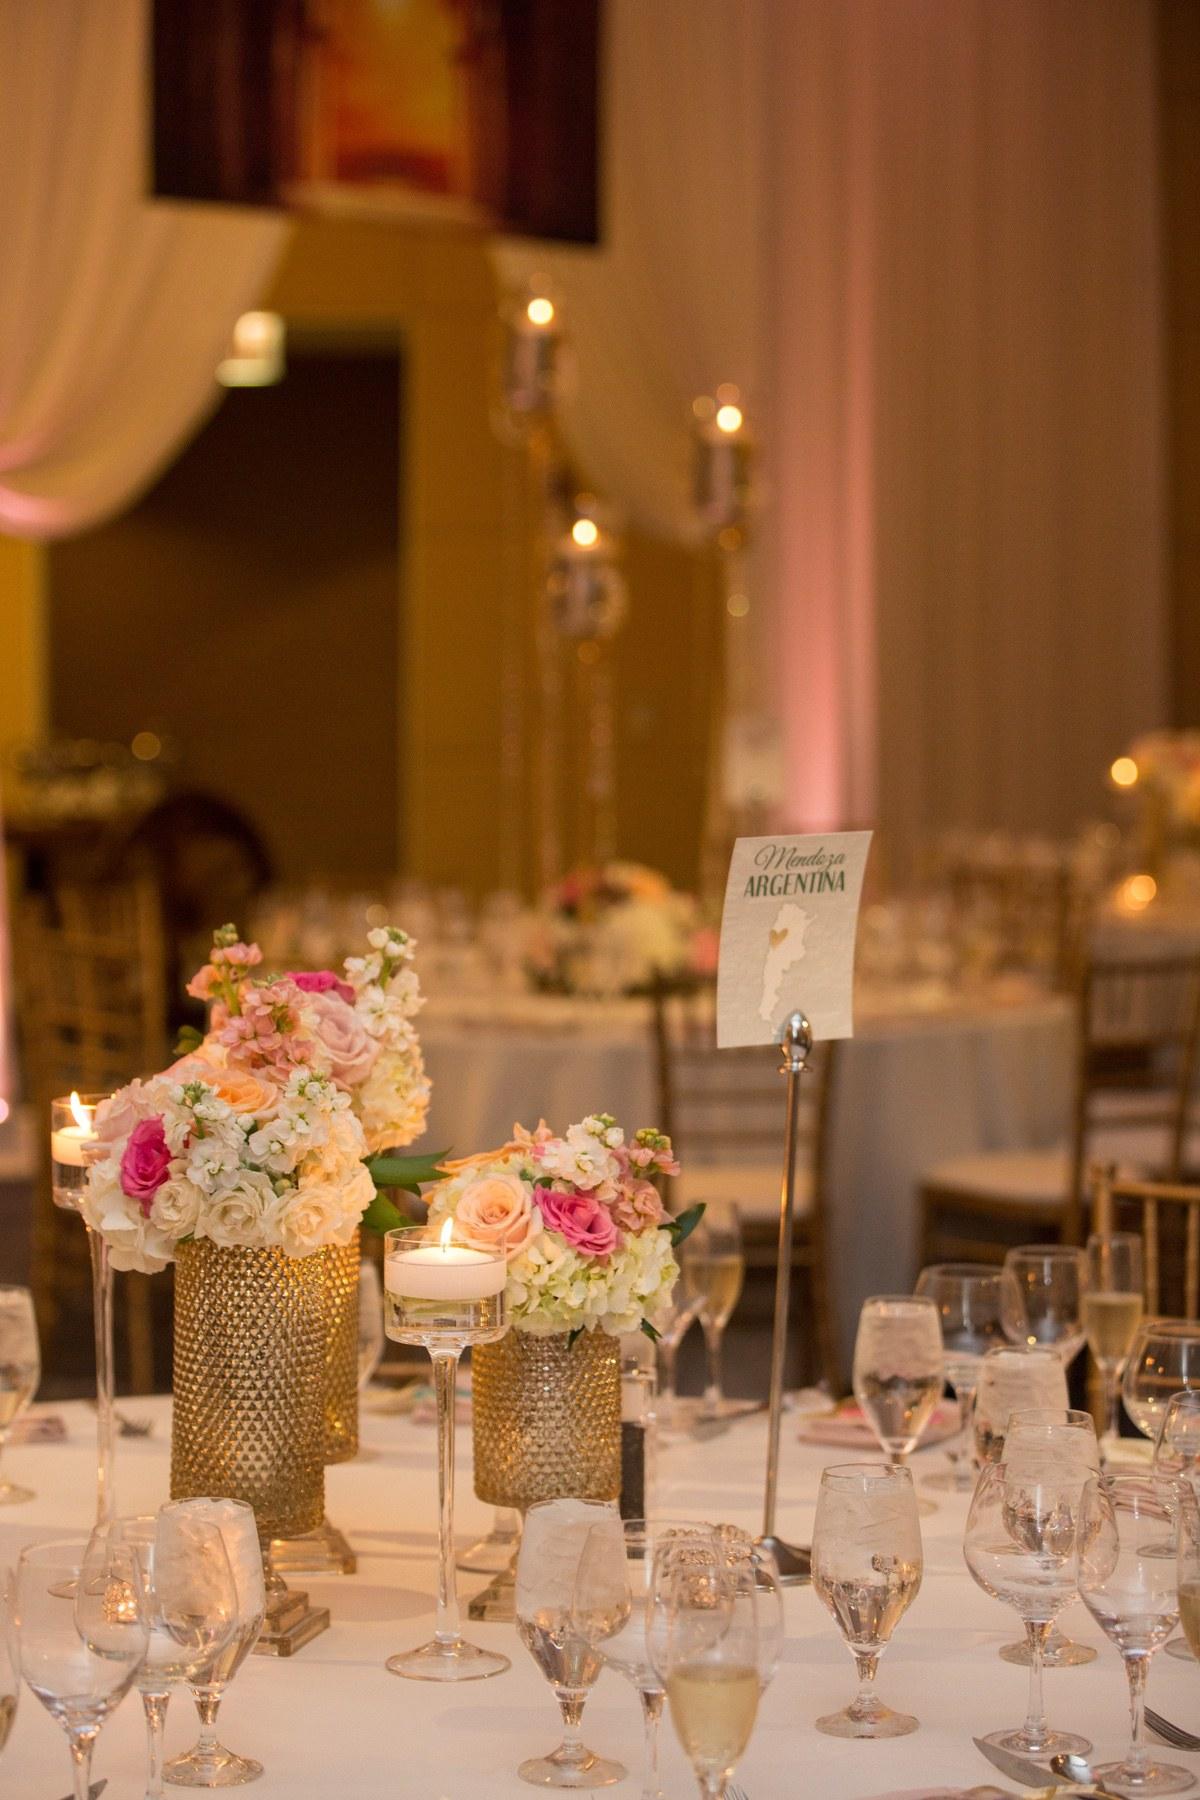 Le Cape Weddings - South Asian Wedding - Trisha and Jordan - Reception Details --23.jpg